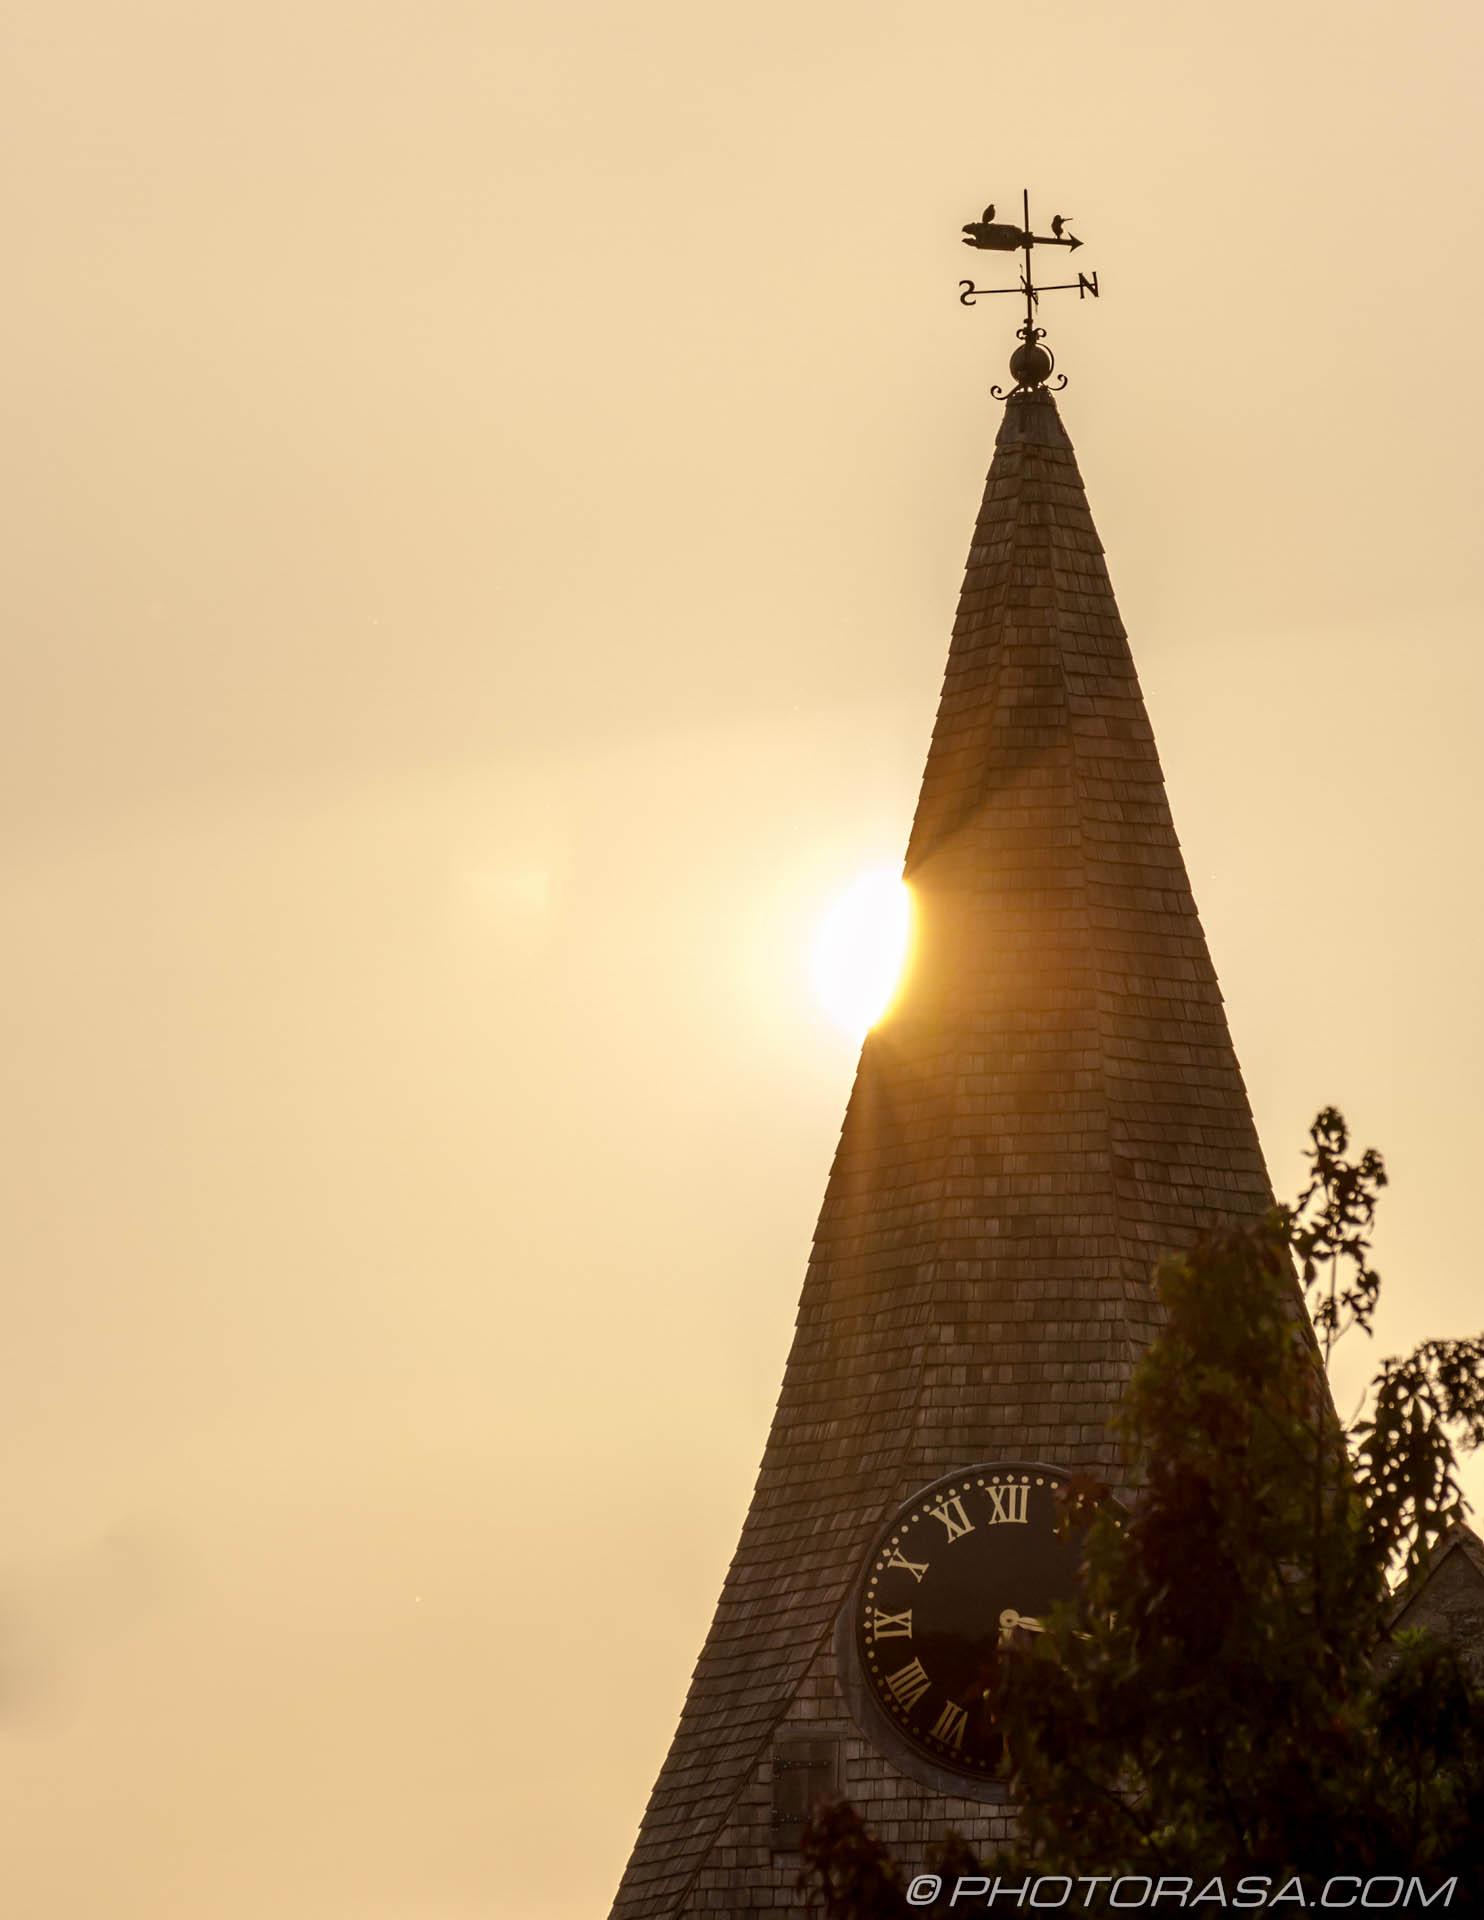 https://photorasa.com/loose-village/sun-peeking-from-behind-loose-church-spire/